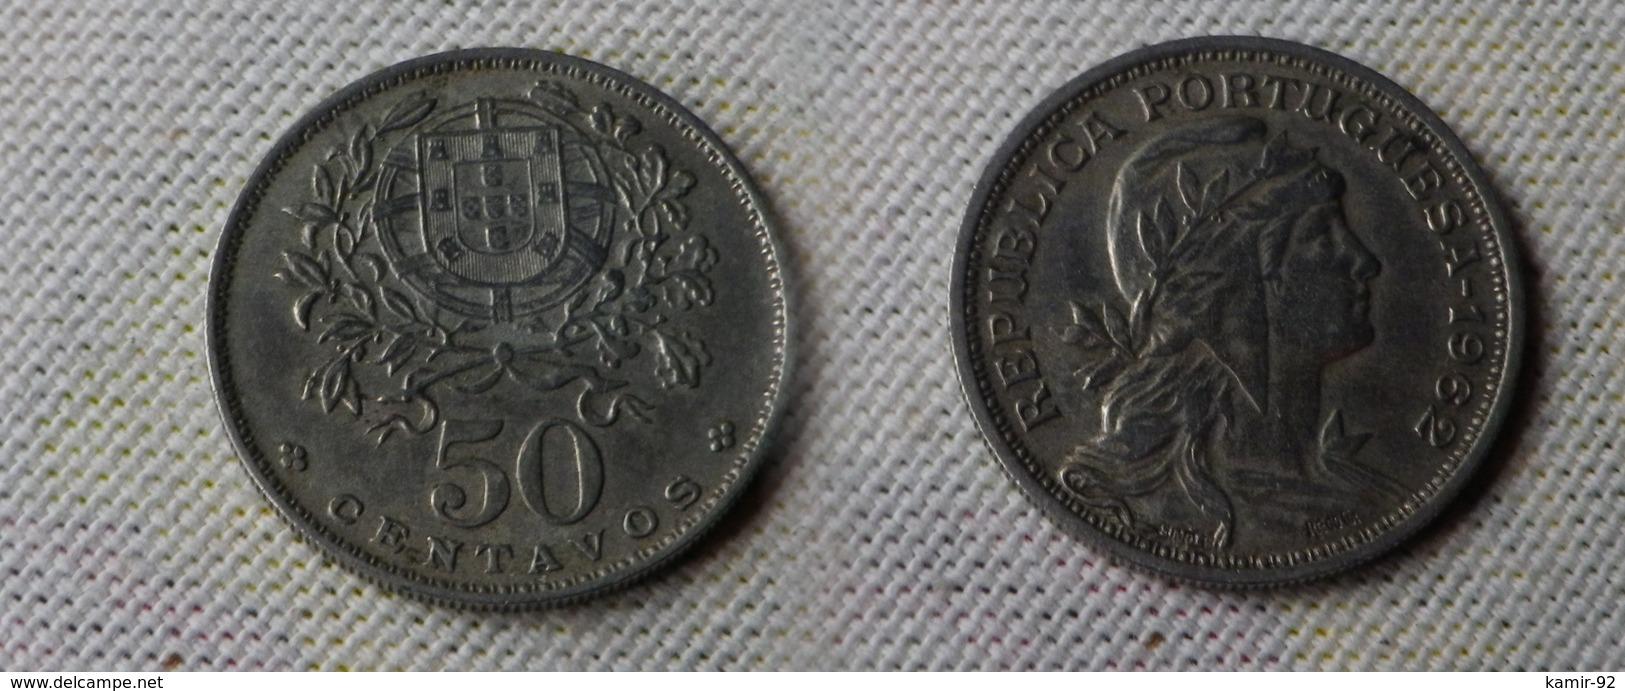 Portugal 50  Centavos 1962     Km#577  -       Ttb - Portugal